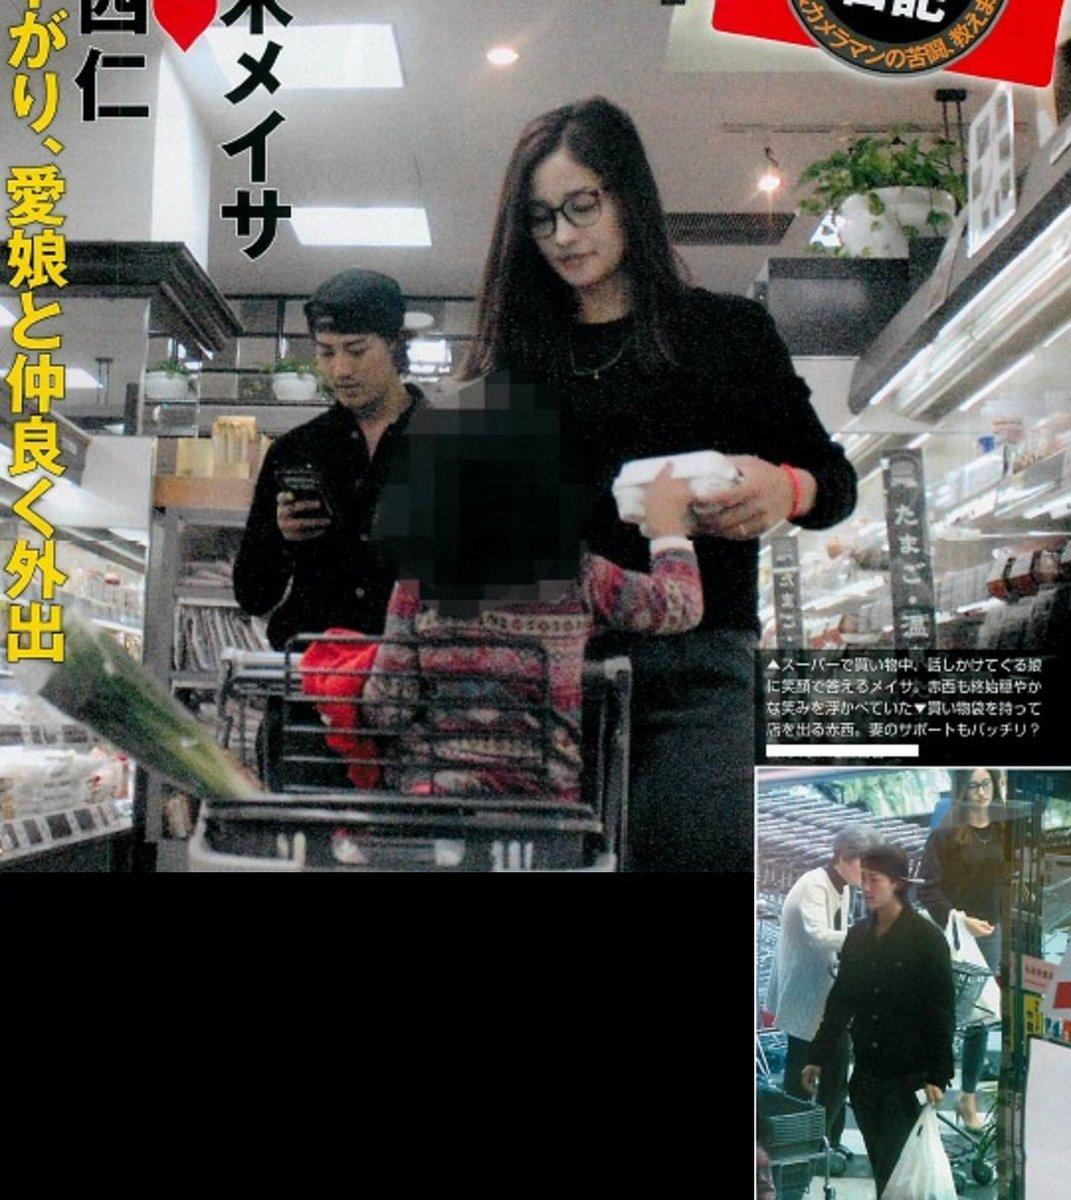 akanishi jin and kuroki meisa dating